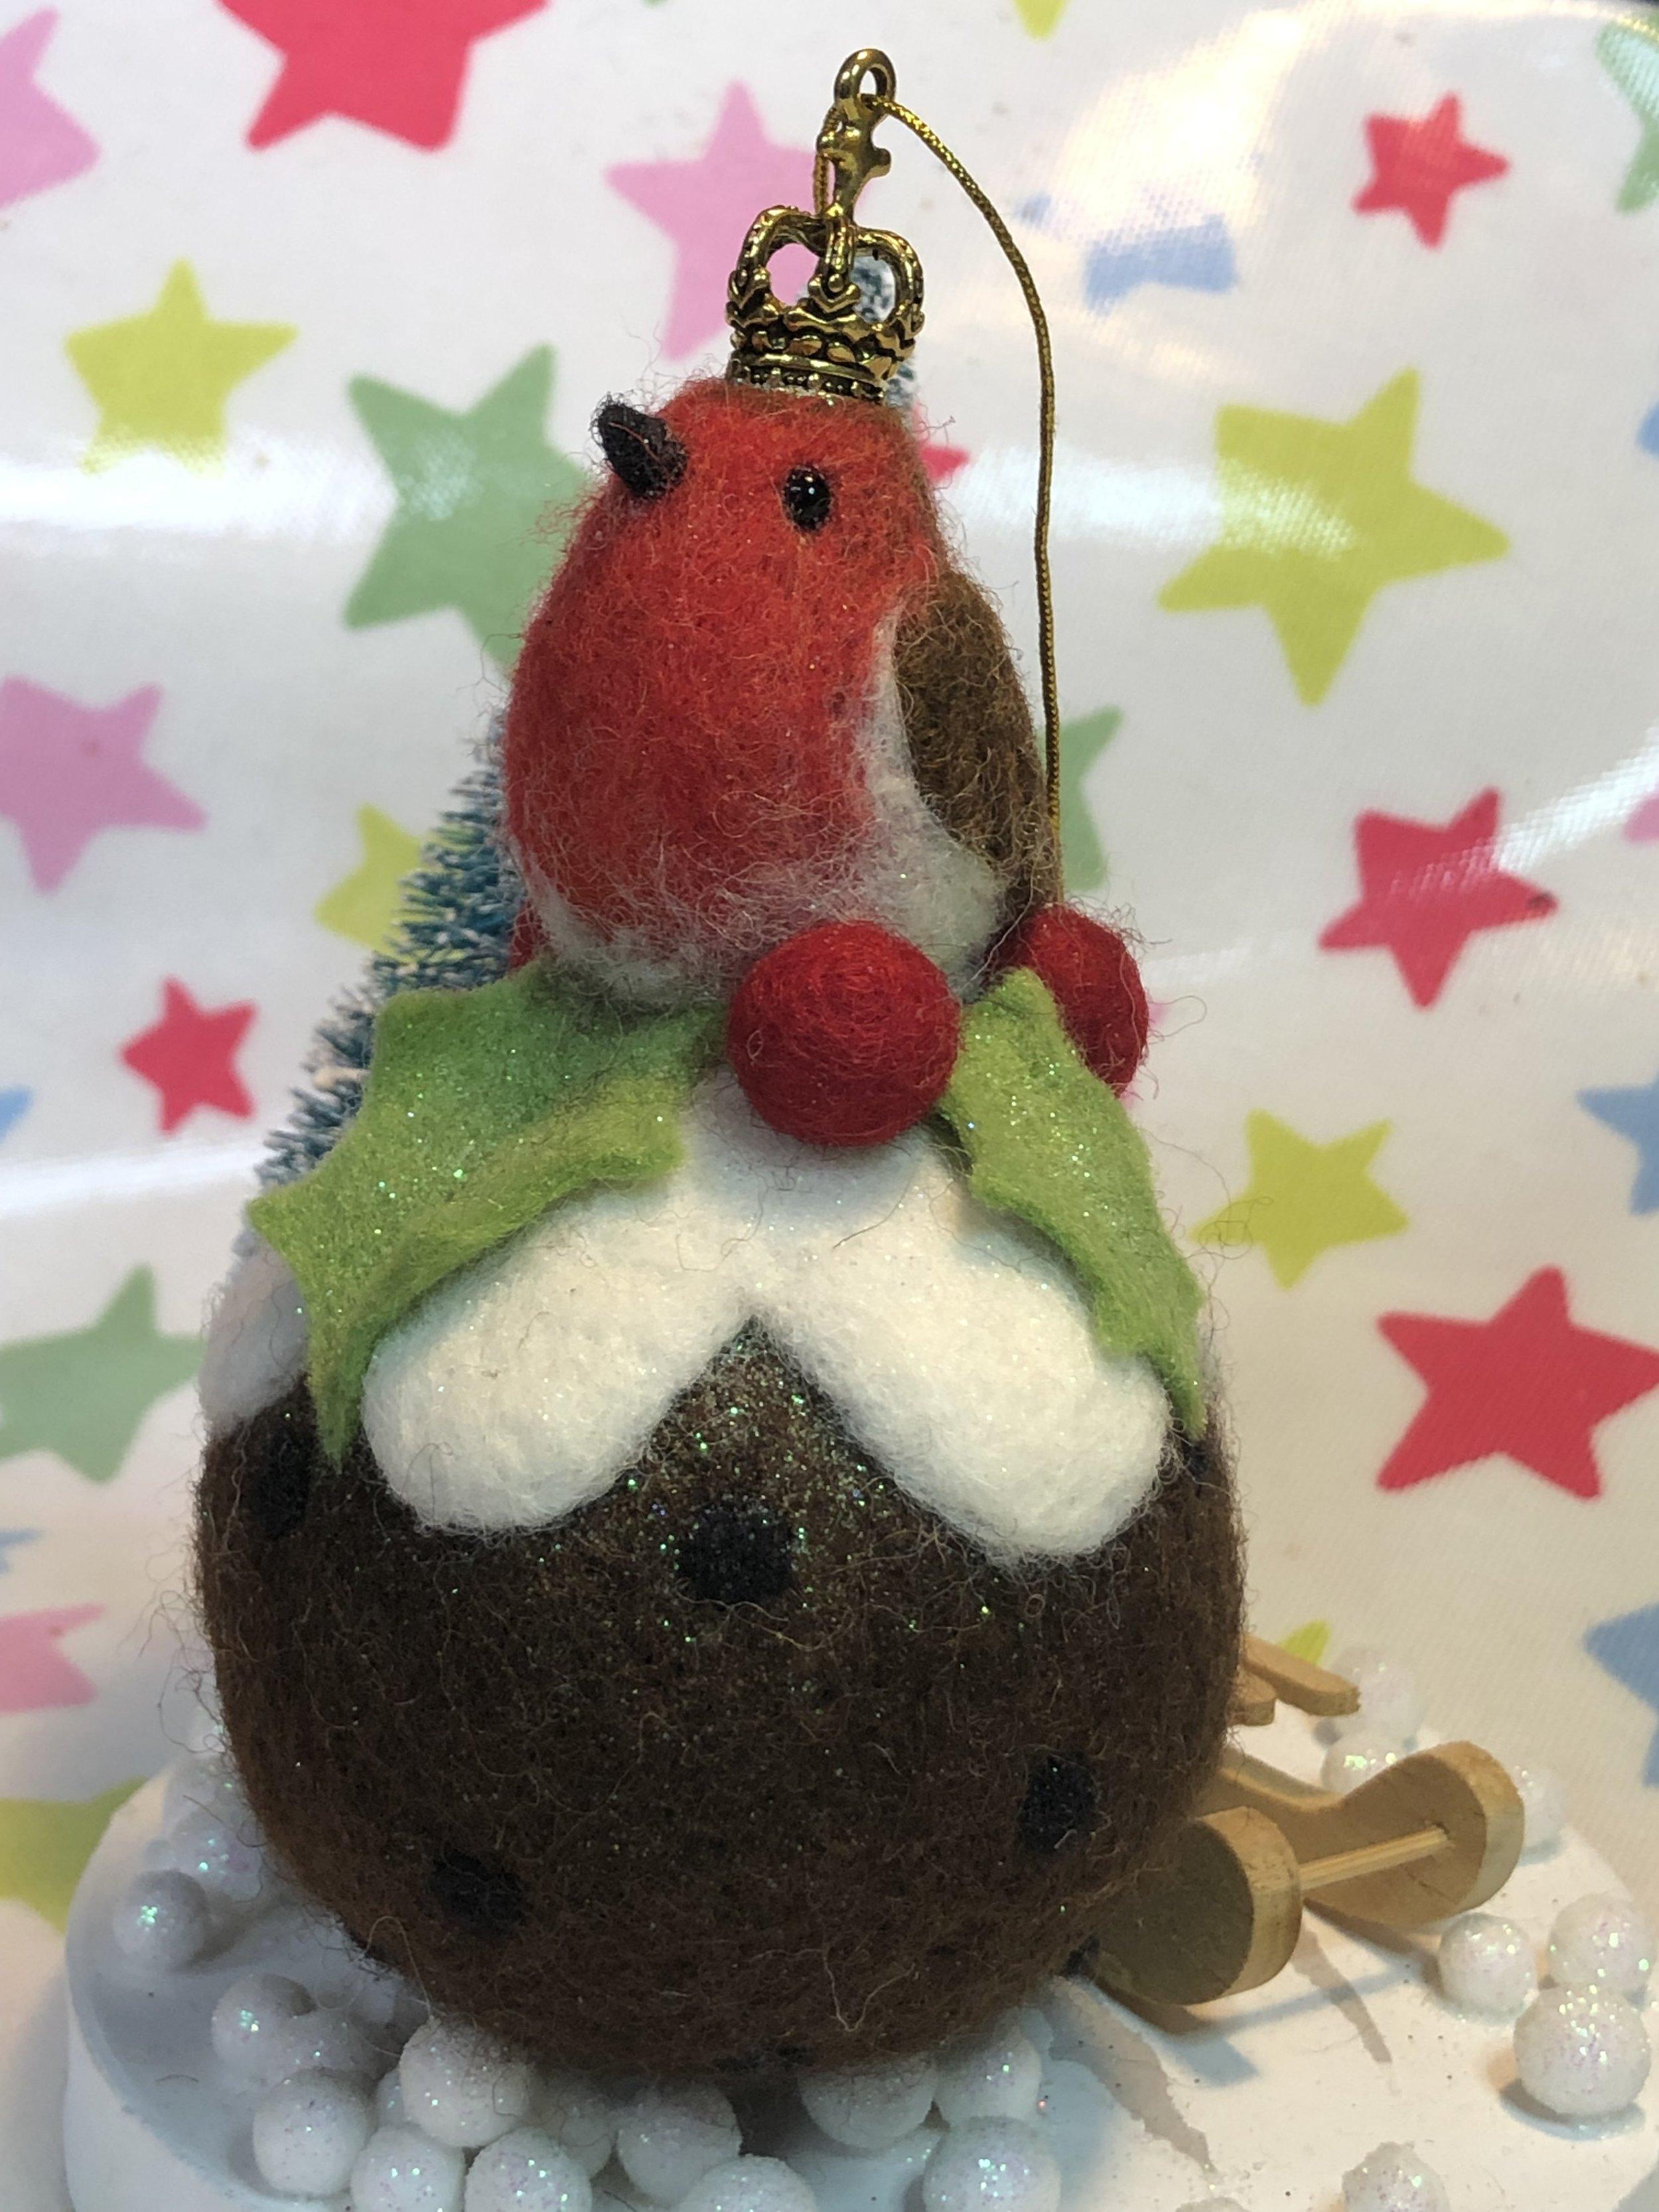 IMG_2719.JPG Christmas bauble